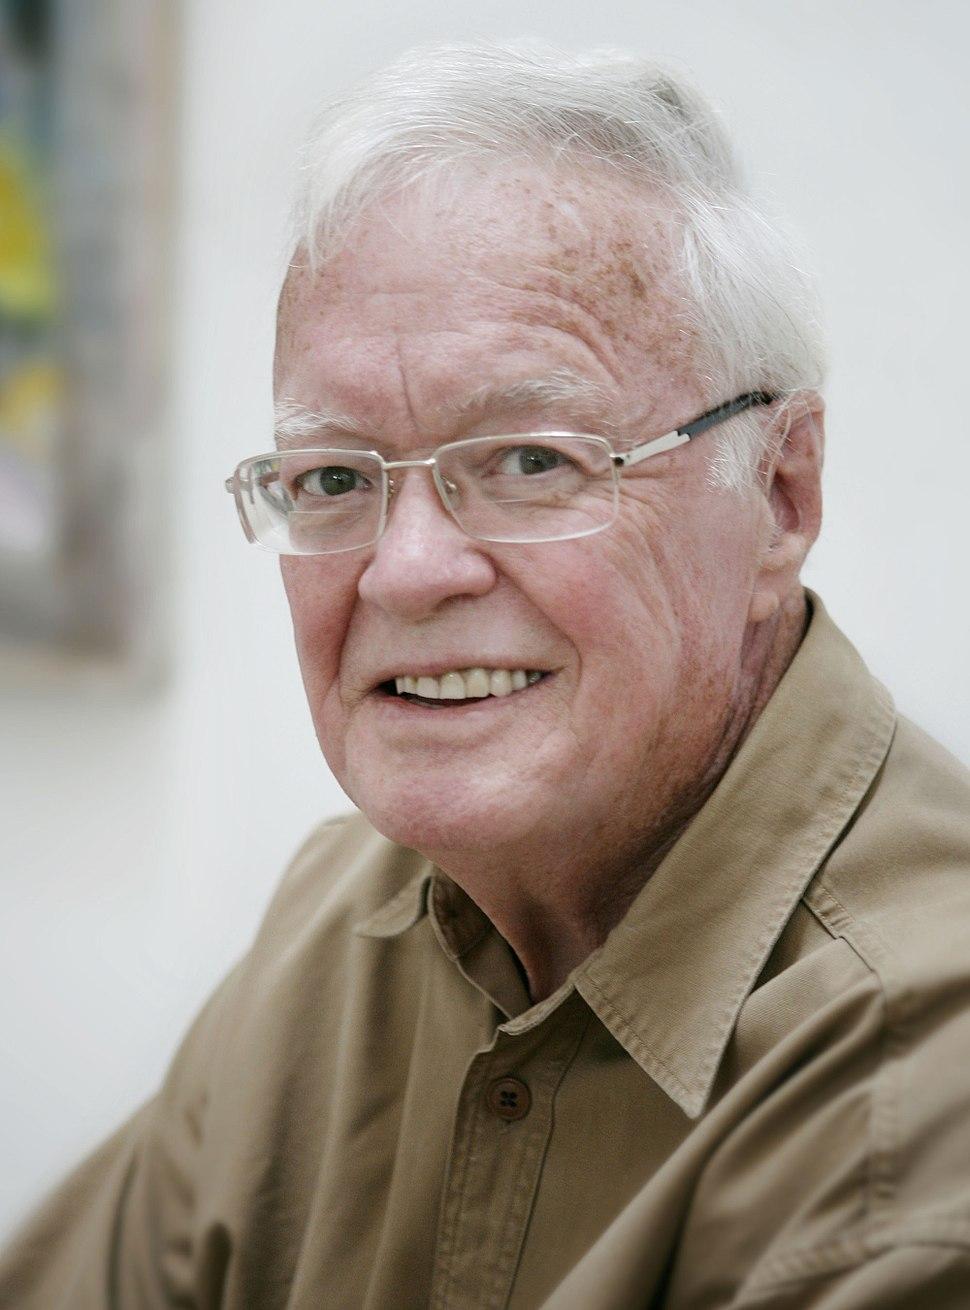 John Beardman